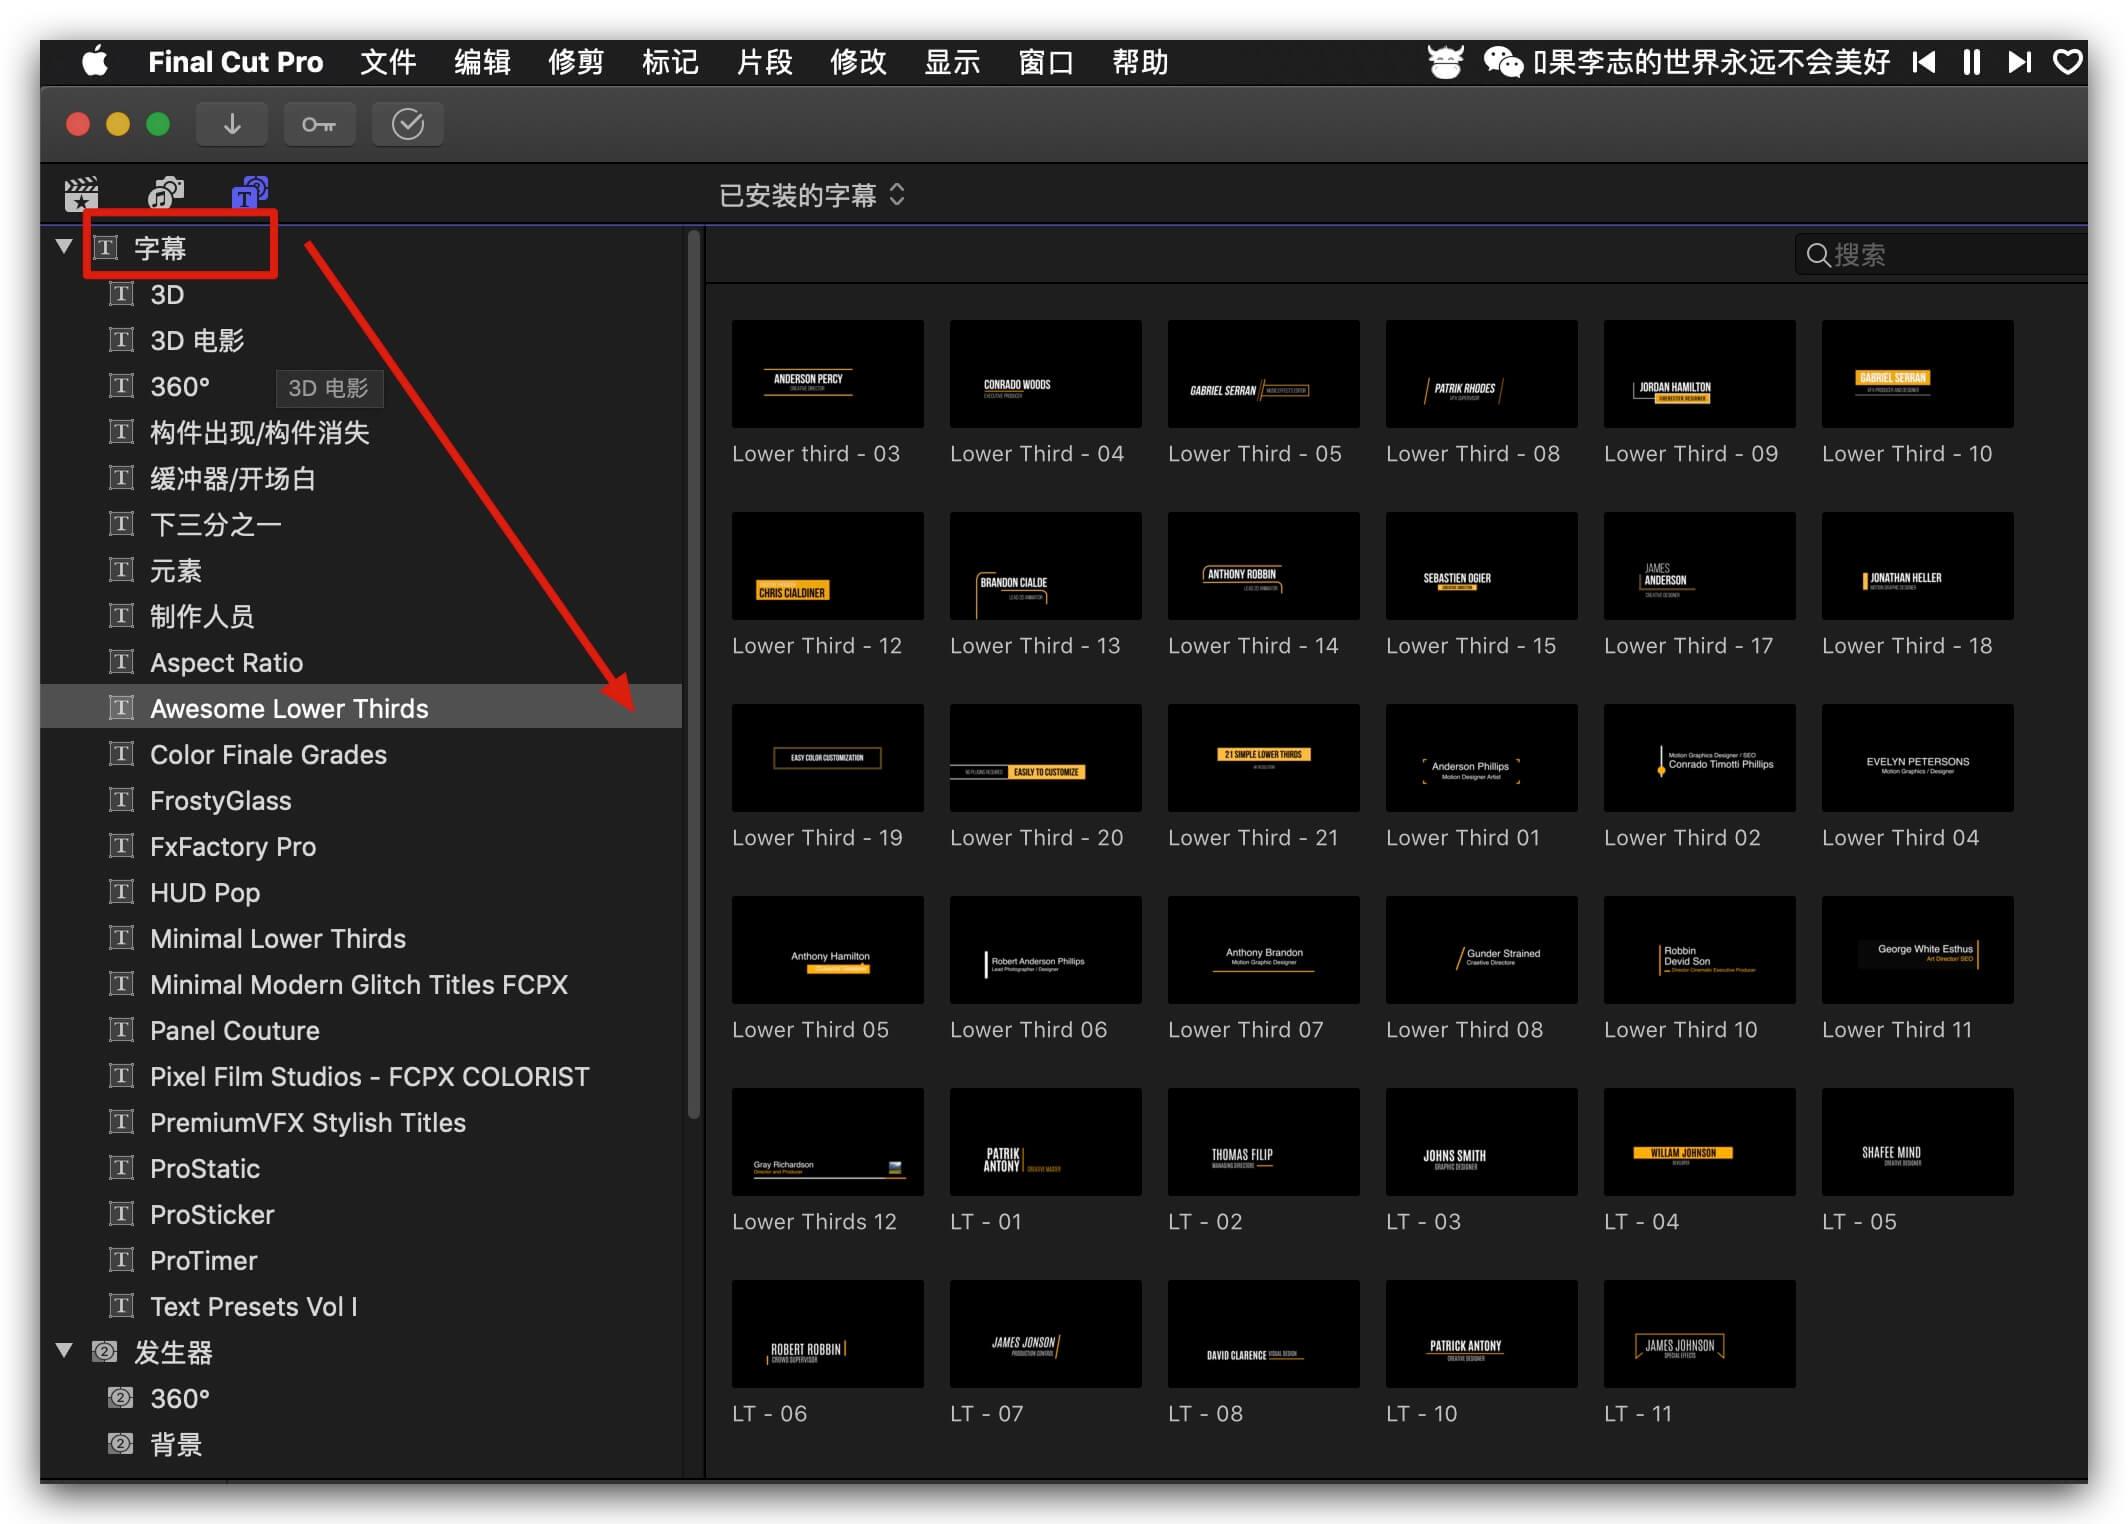 fcpx标题模板 35组干净优雅下三分之一字幕条预设插件 Awesome Lower Thirds